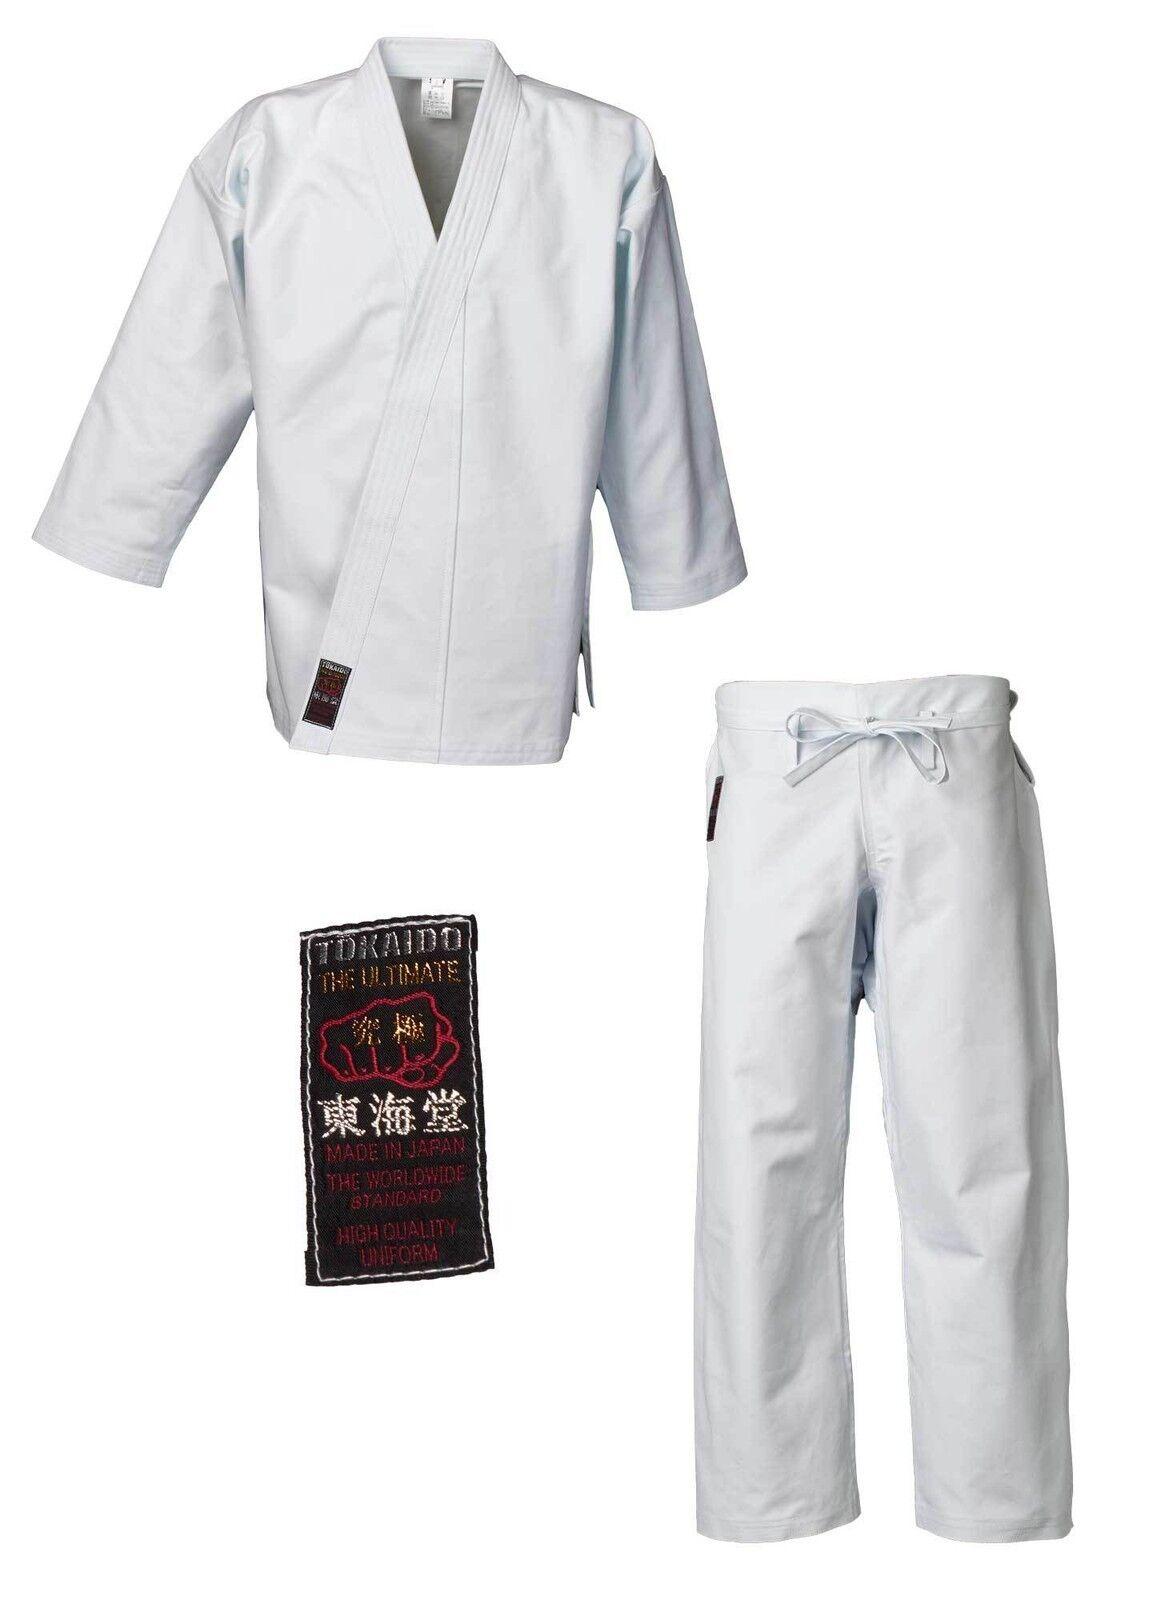 Karategi Tokaido Ultimate 12OZ MADE IN IN IN JAPAN Karate Anzug Karateanzug 803e4d